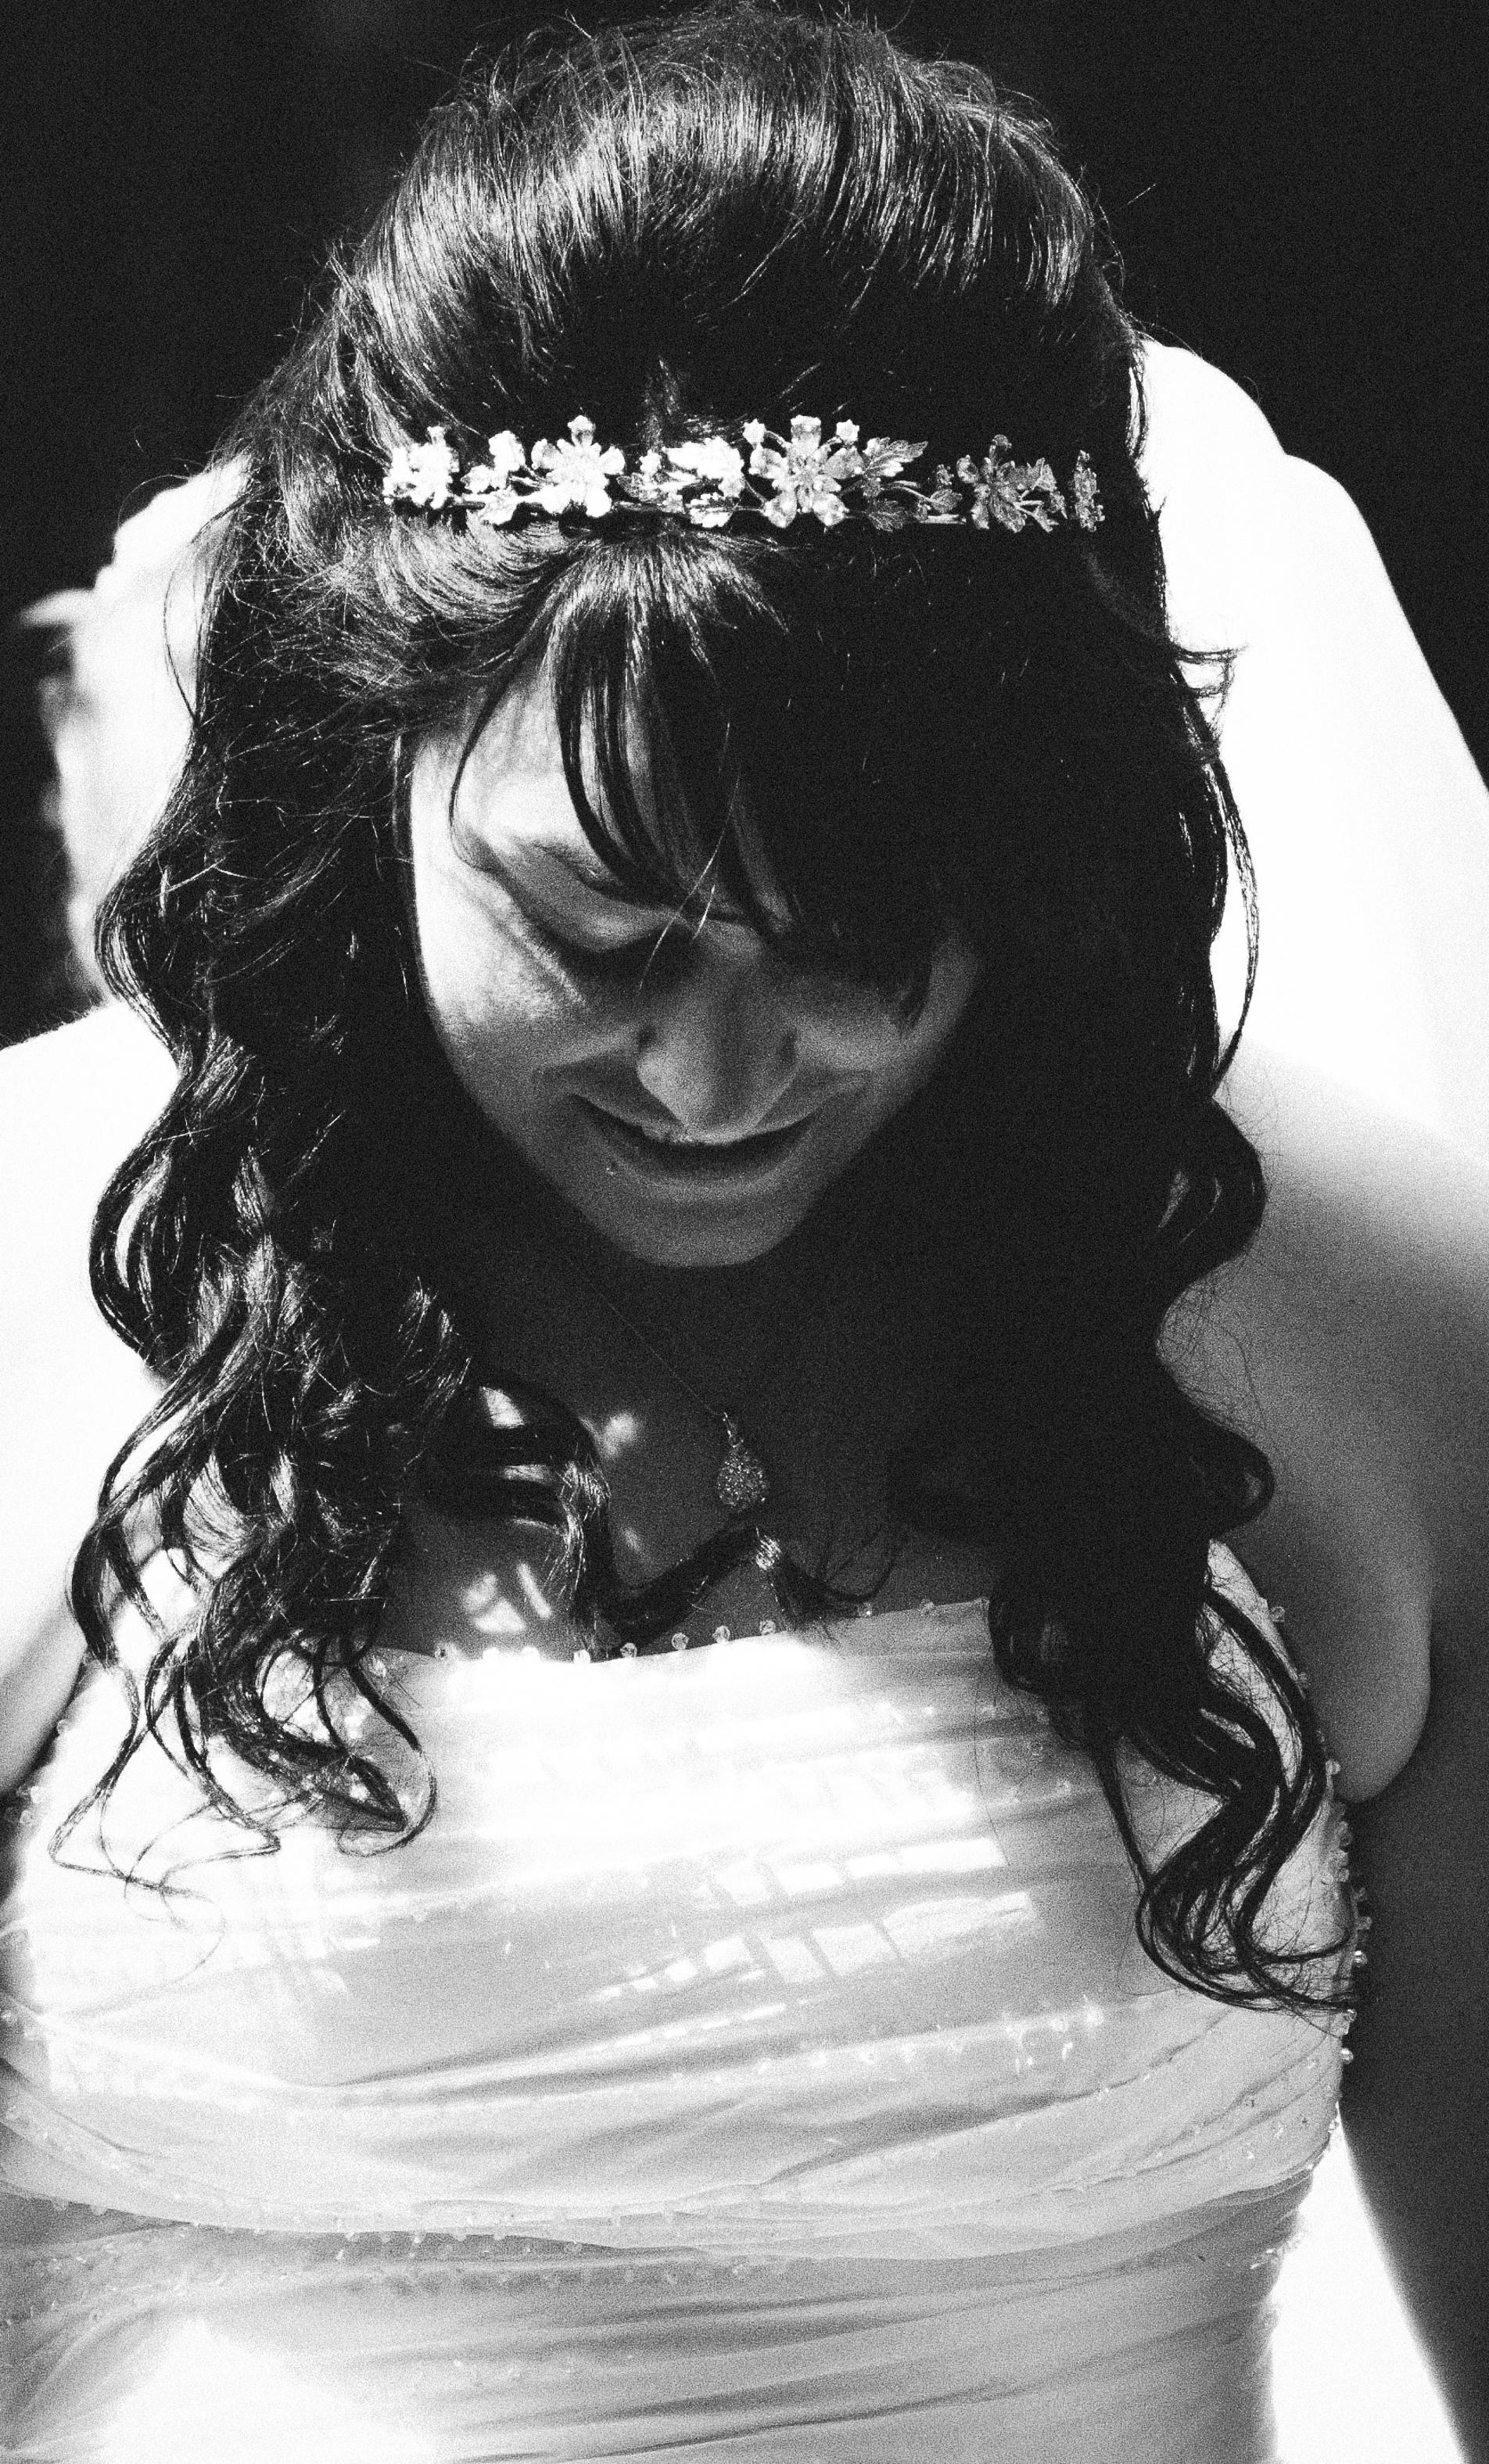 My first wedding.  Nikon D300 | 50mm | F4 - 1/4000th - iso1000